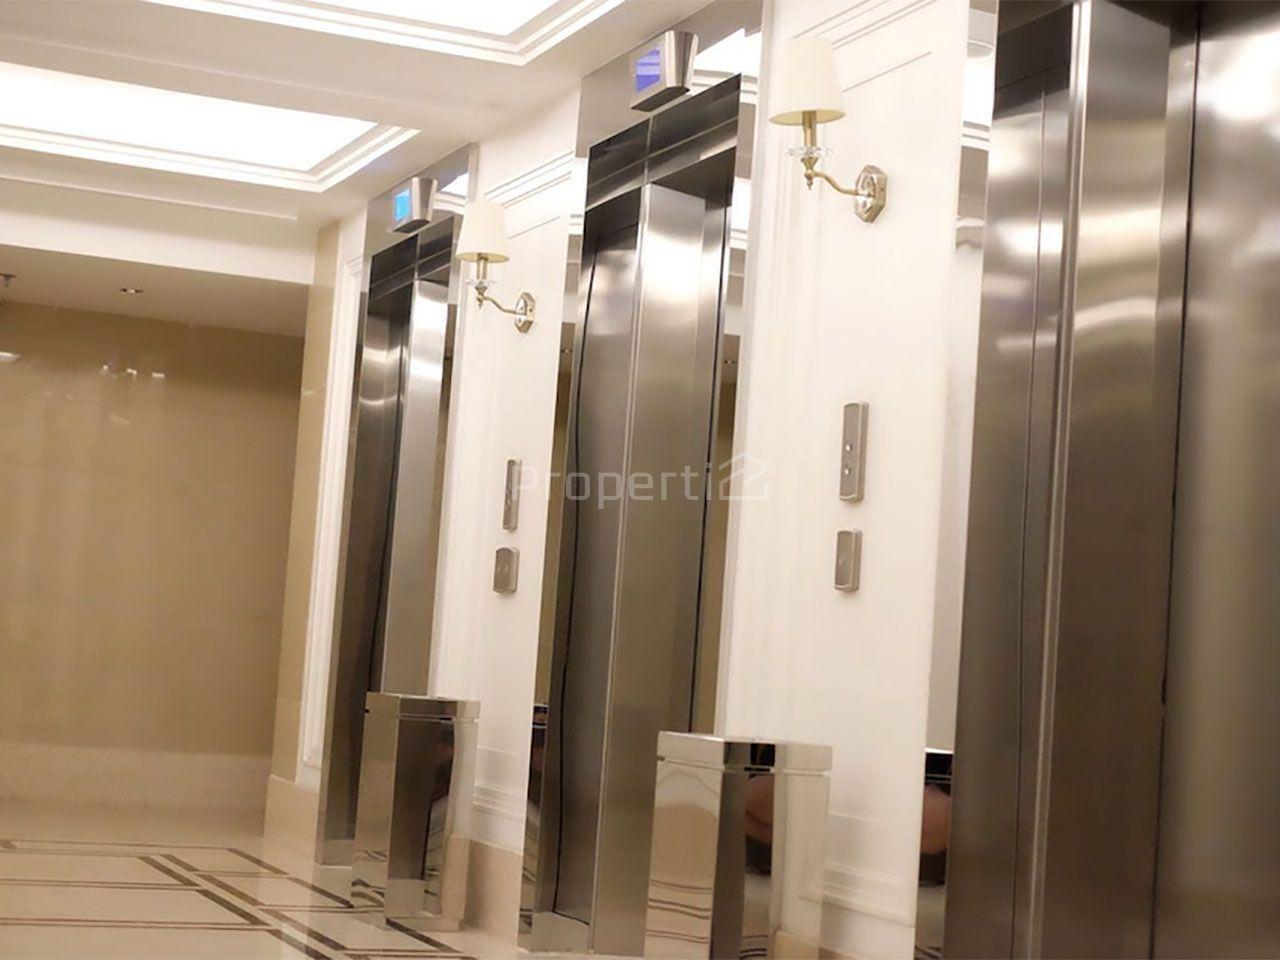 2 BR Unit at 15th Floor Bellavista Tower, The Mansion, DKI Jakarta